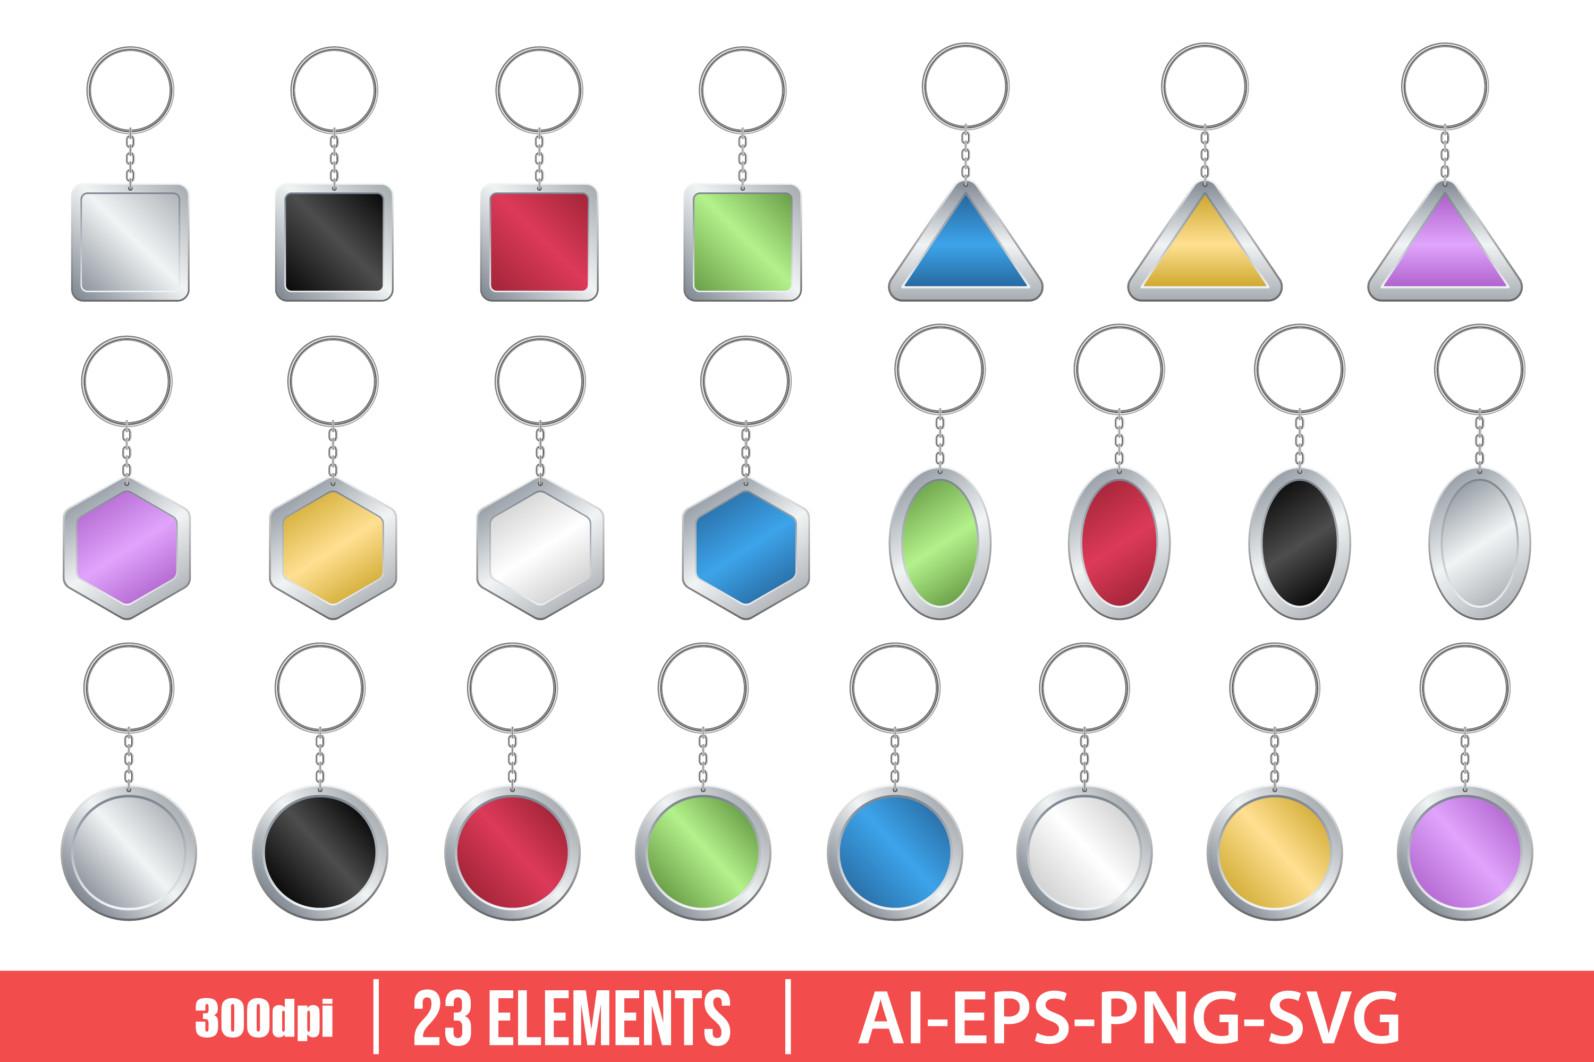 Key chain clipart vector design illustration. Key ring set. Vector Clipart Print - KEY RING scaled -